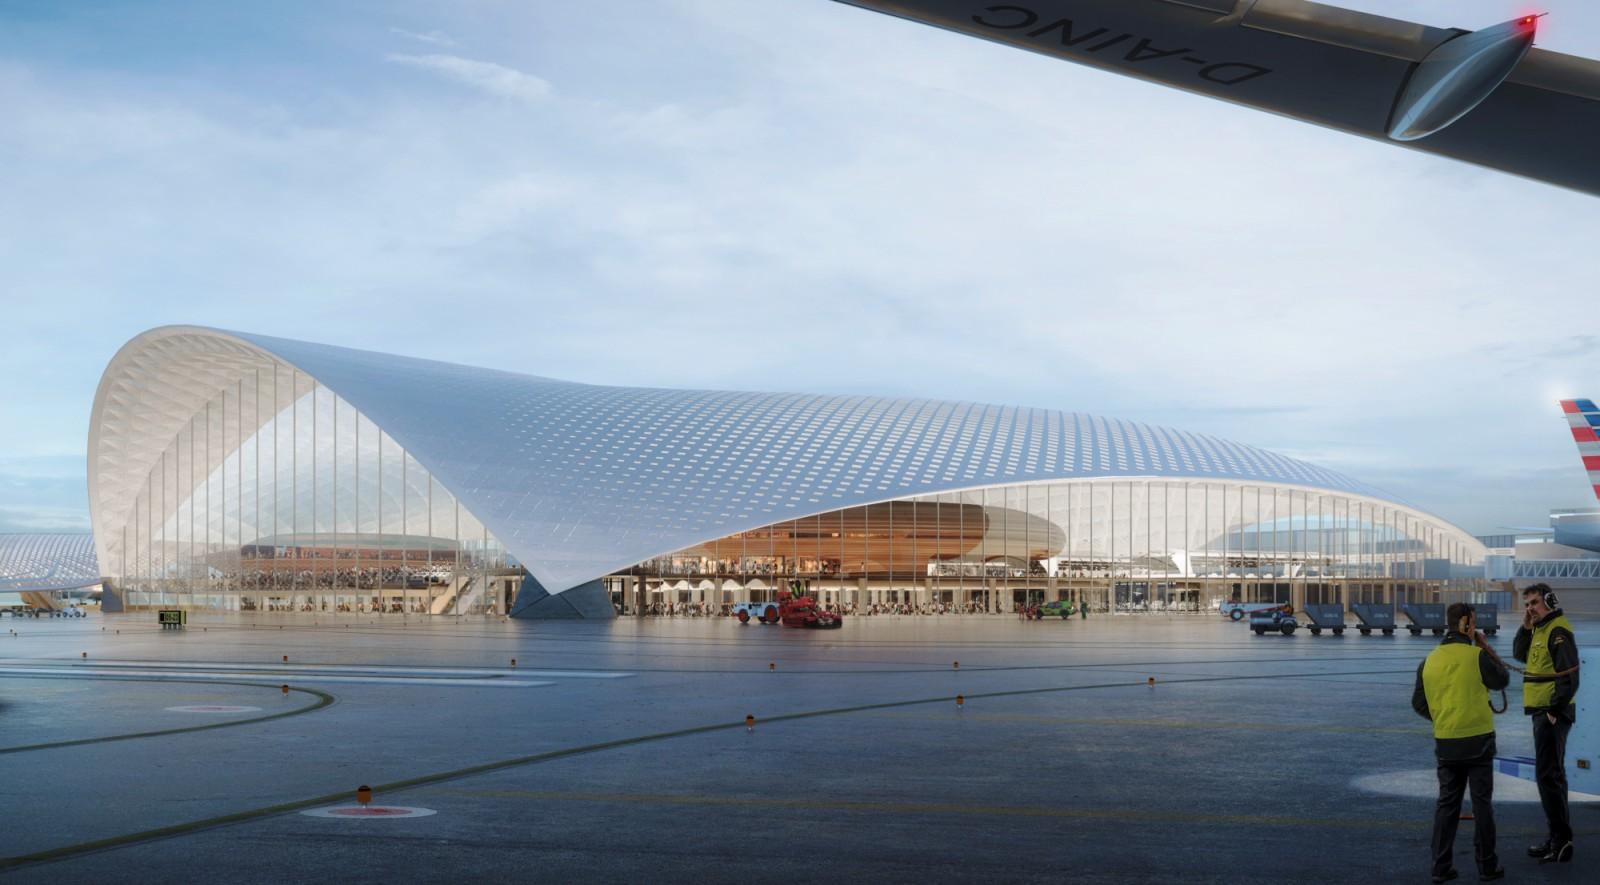 O'Hare Global Terminal